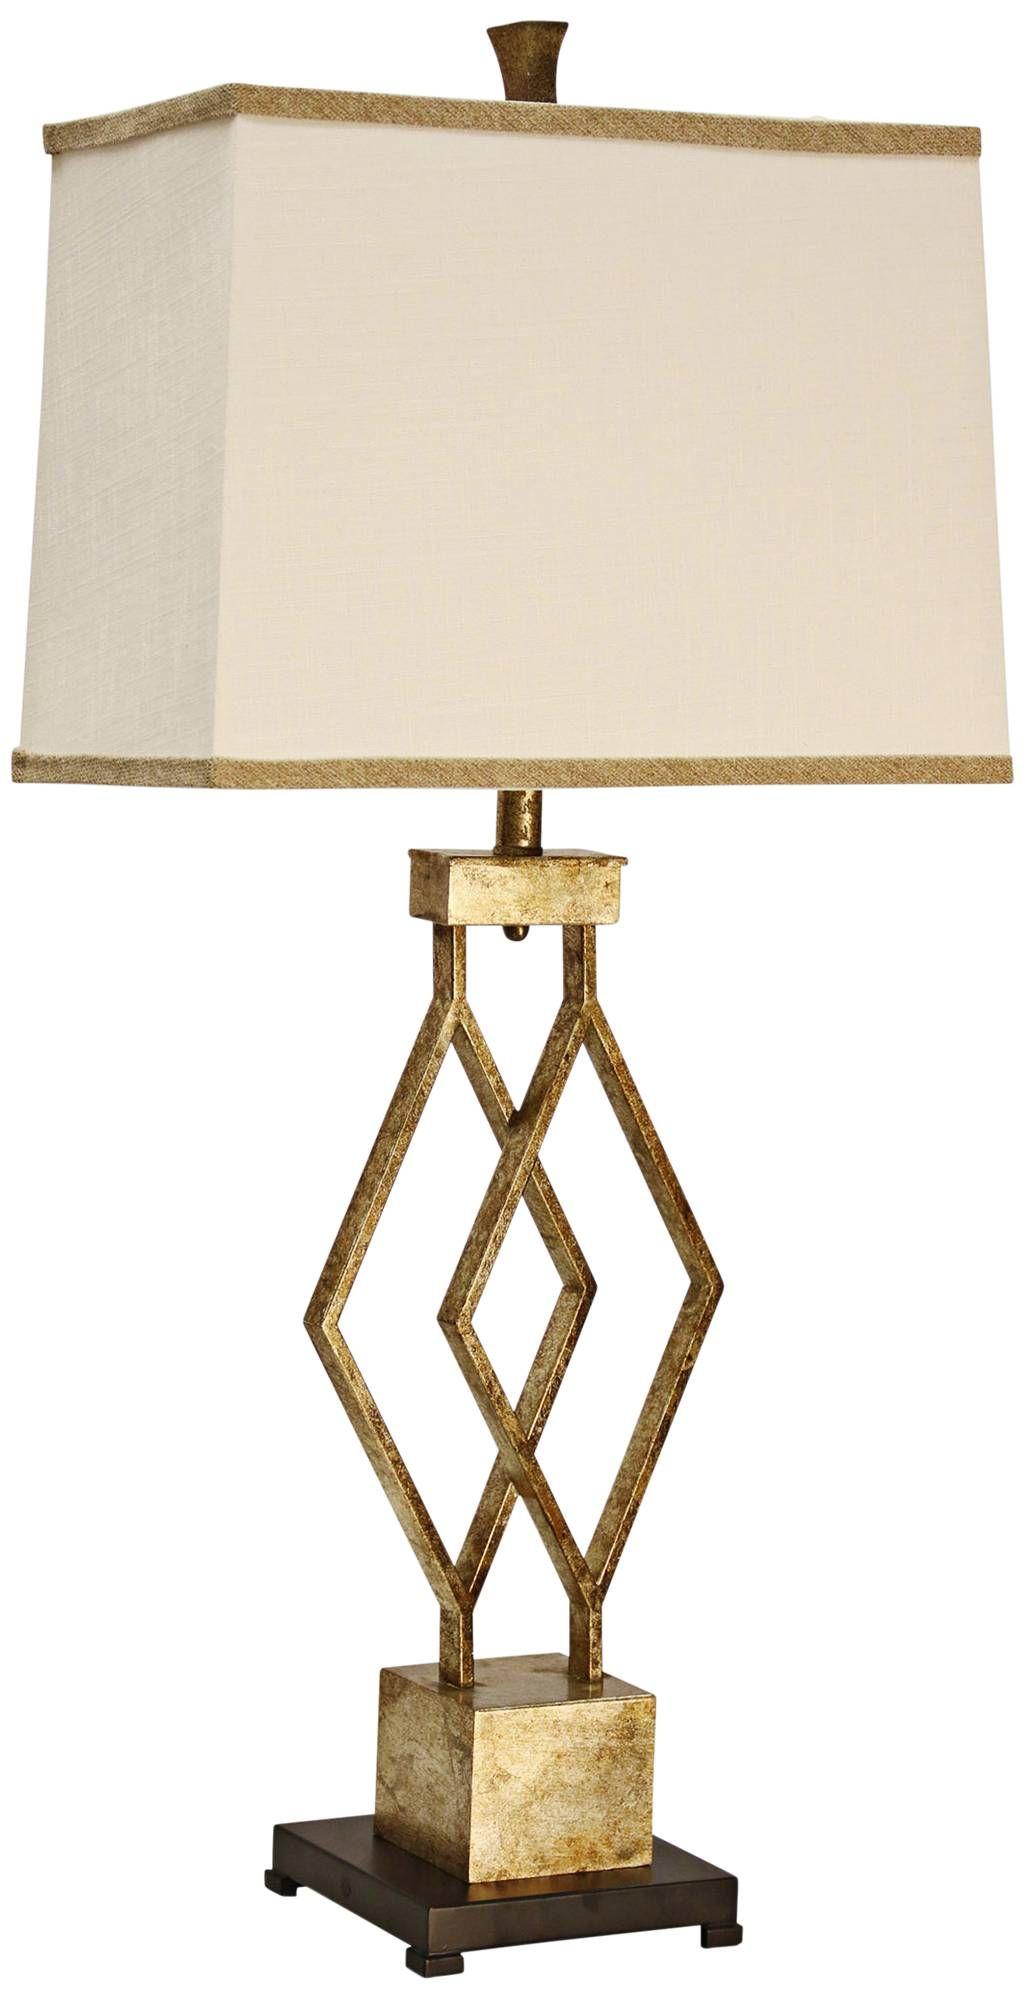 Lenor Gold Metal Table Lamp 18r28 Lamps Plus Gold Metal Table Table Lamp Vintage Table Lamp